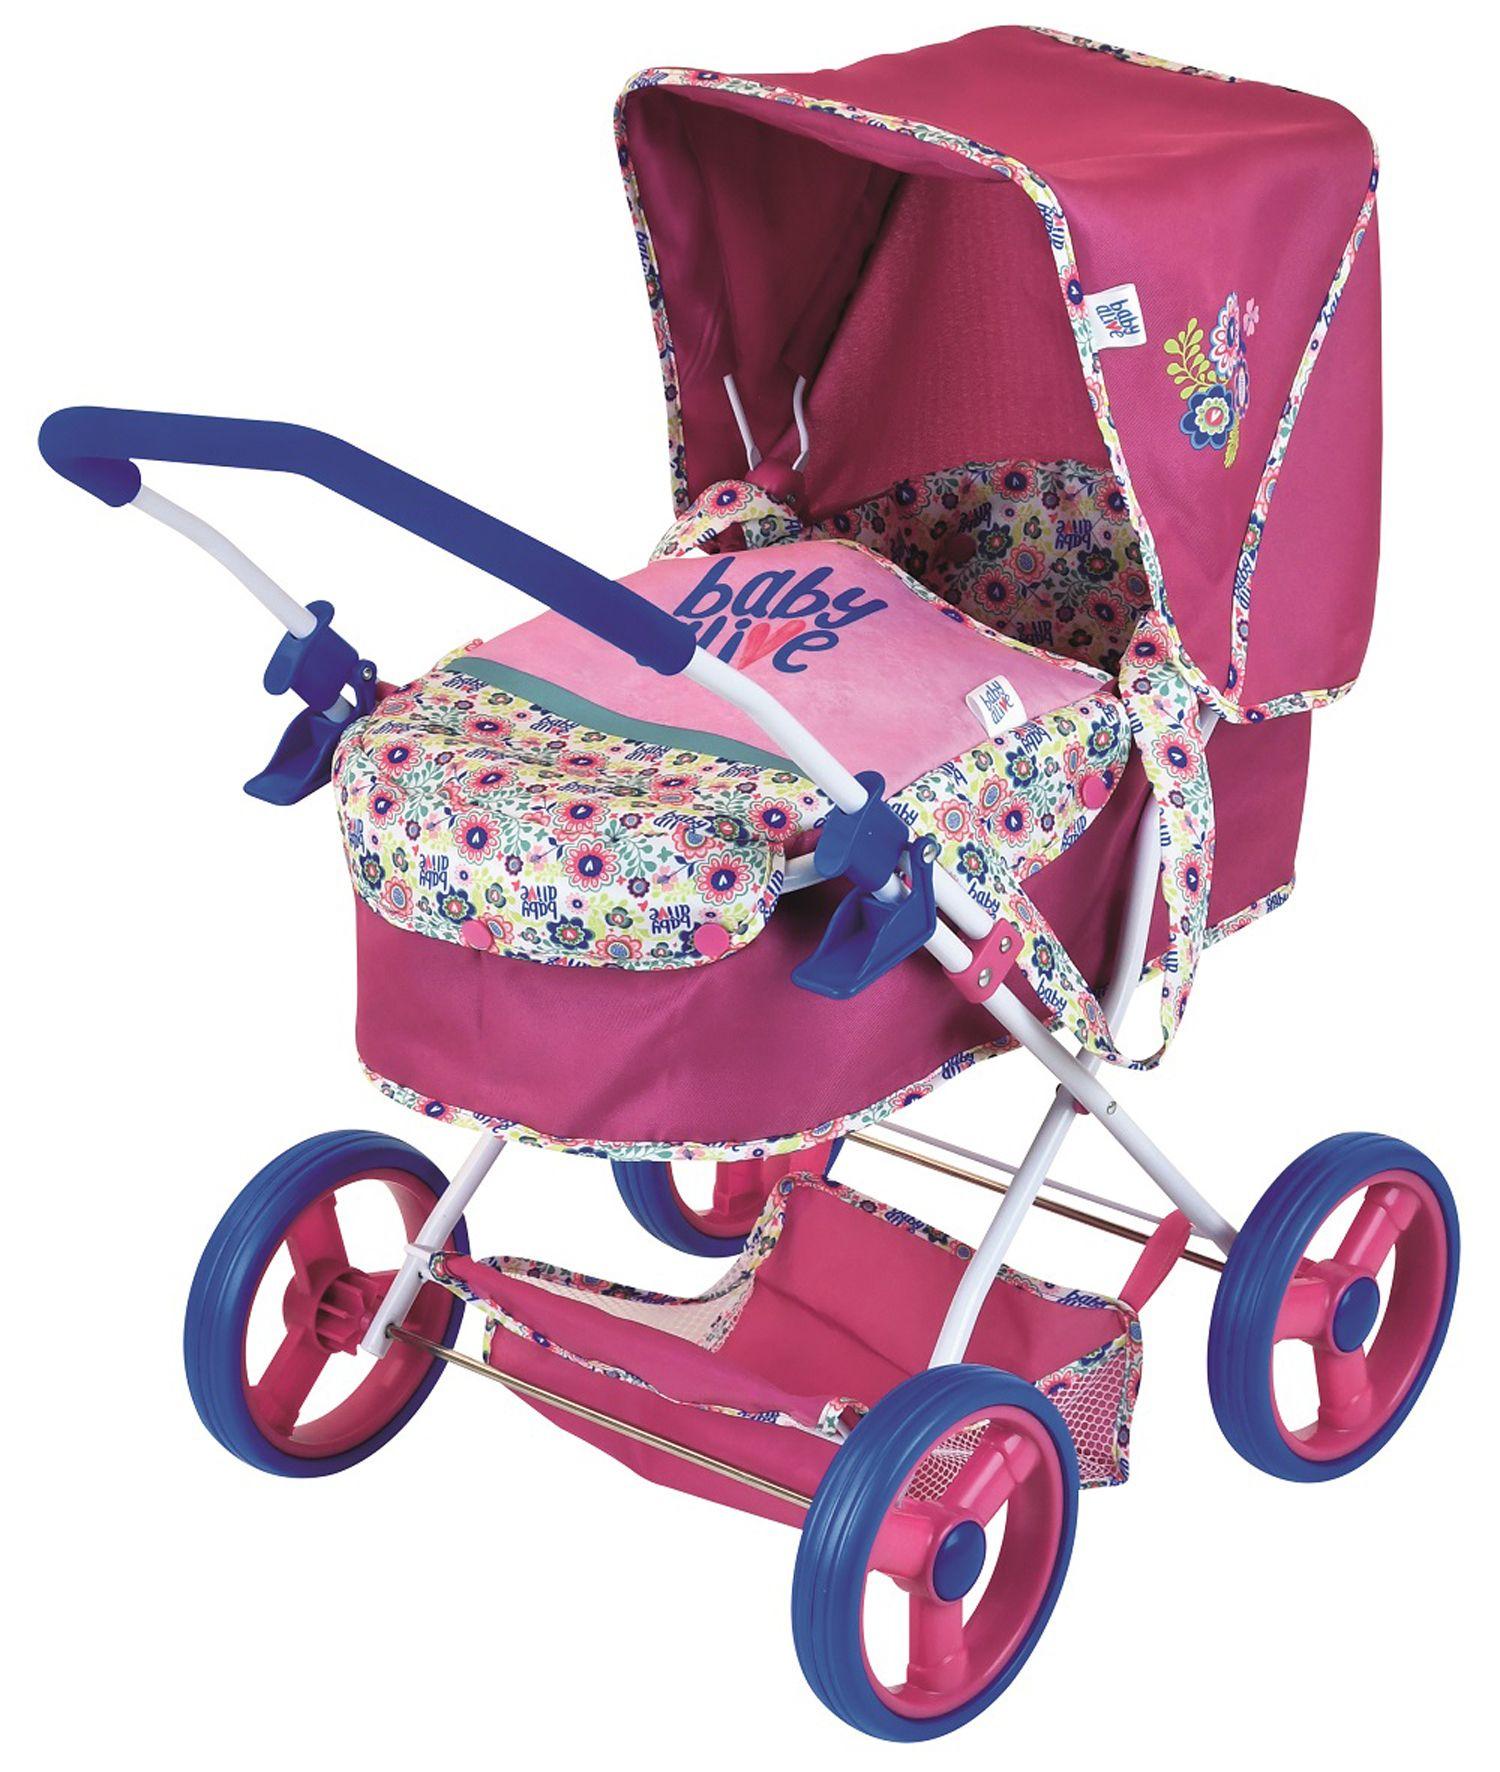 Baby Alive Doll Pram Walmart Com In 2021 Baby Doll Strollers Baby Alive Doll Clothes Baby Alive Dolls